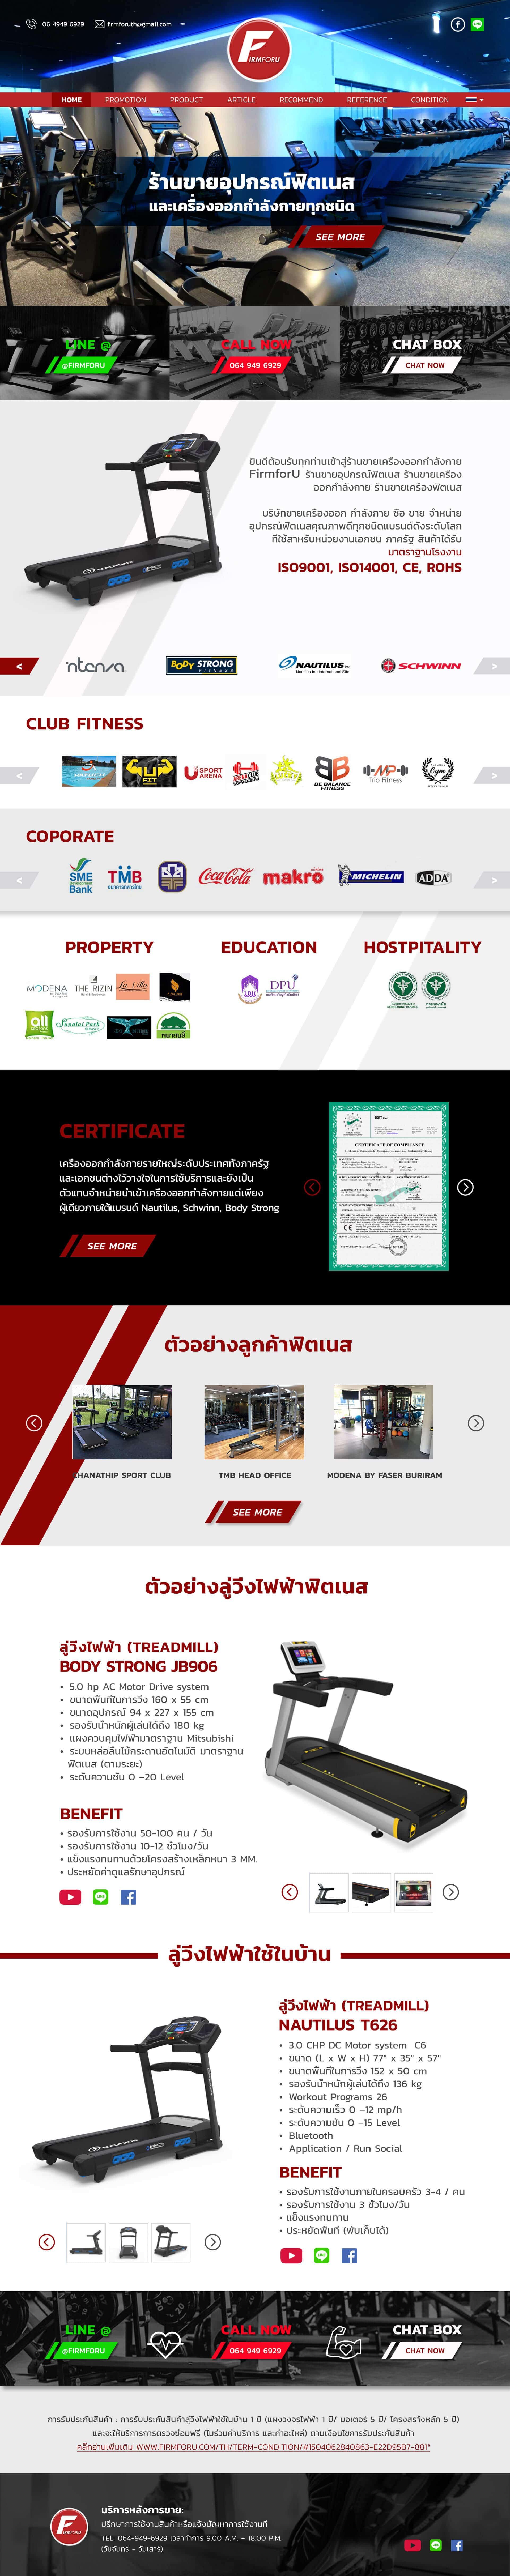 Fitness | บริการรับทำเว็บไซต์ ออกแบบเว็บไซต์ teeneeweb.com